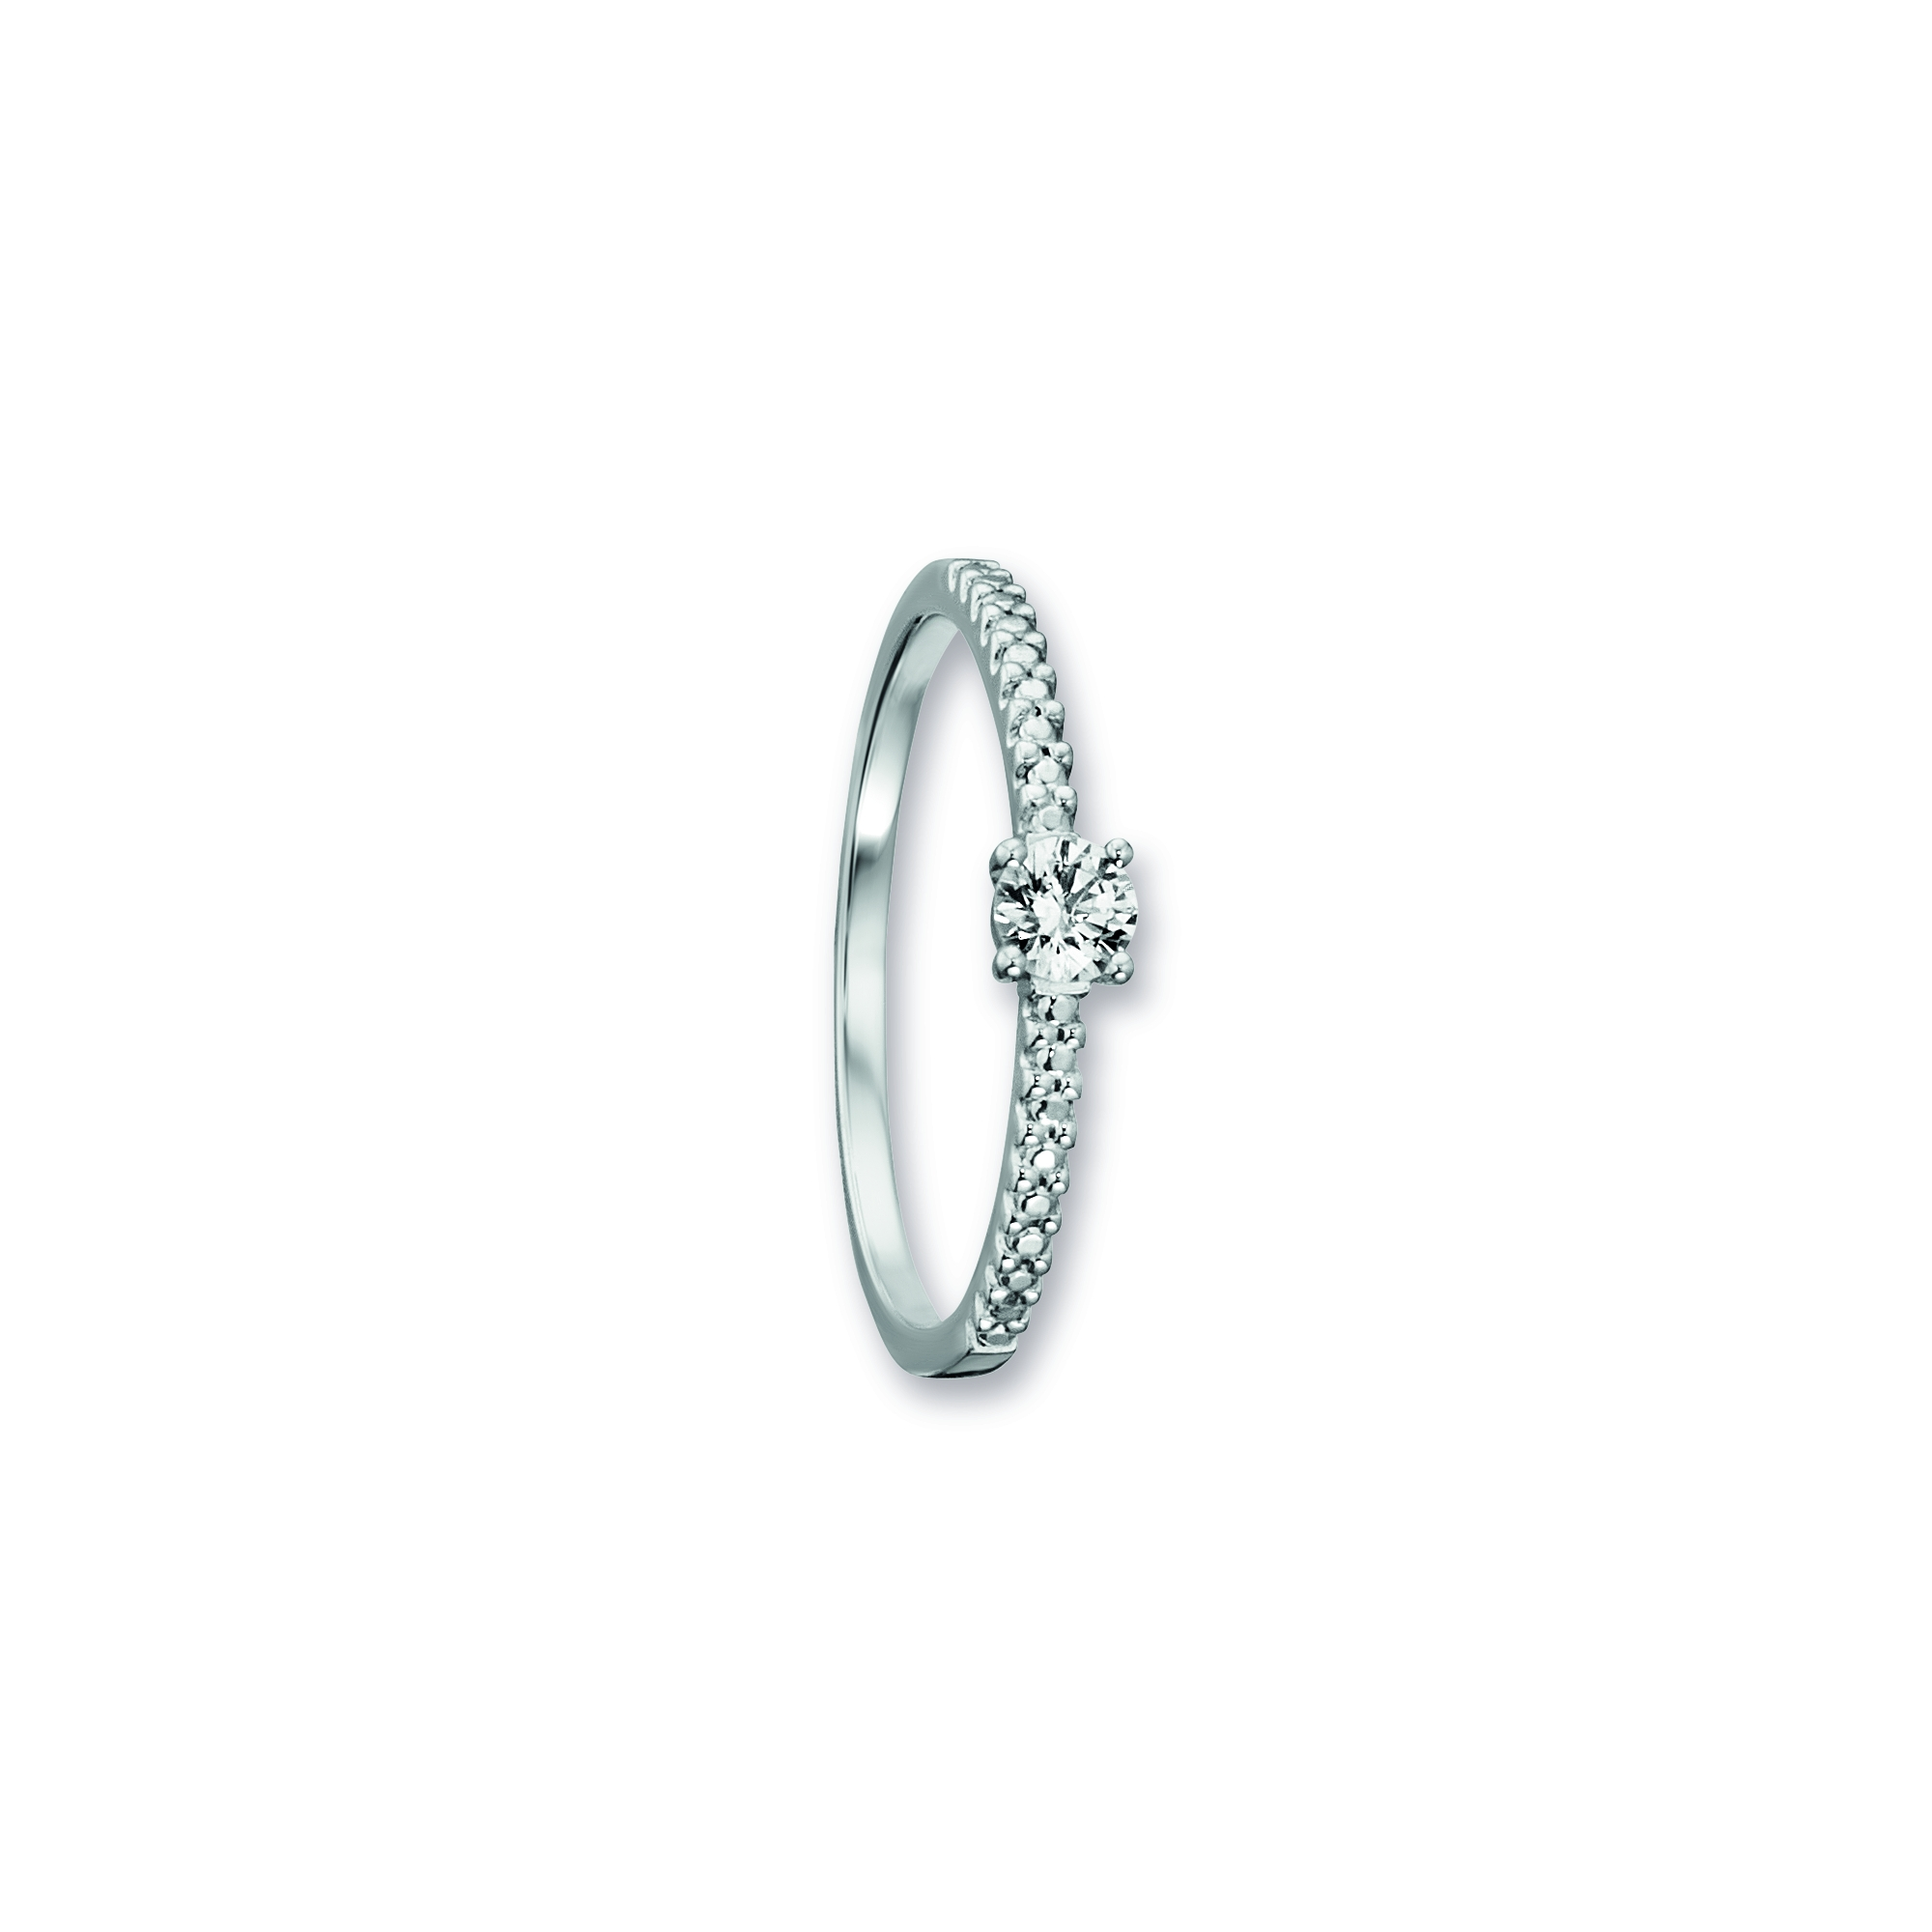 333 Weiß Gold | Ring Zirkonia